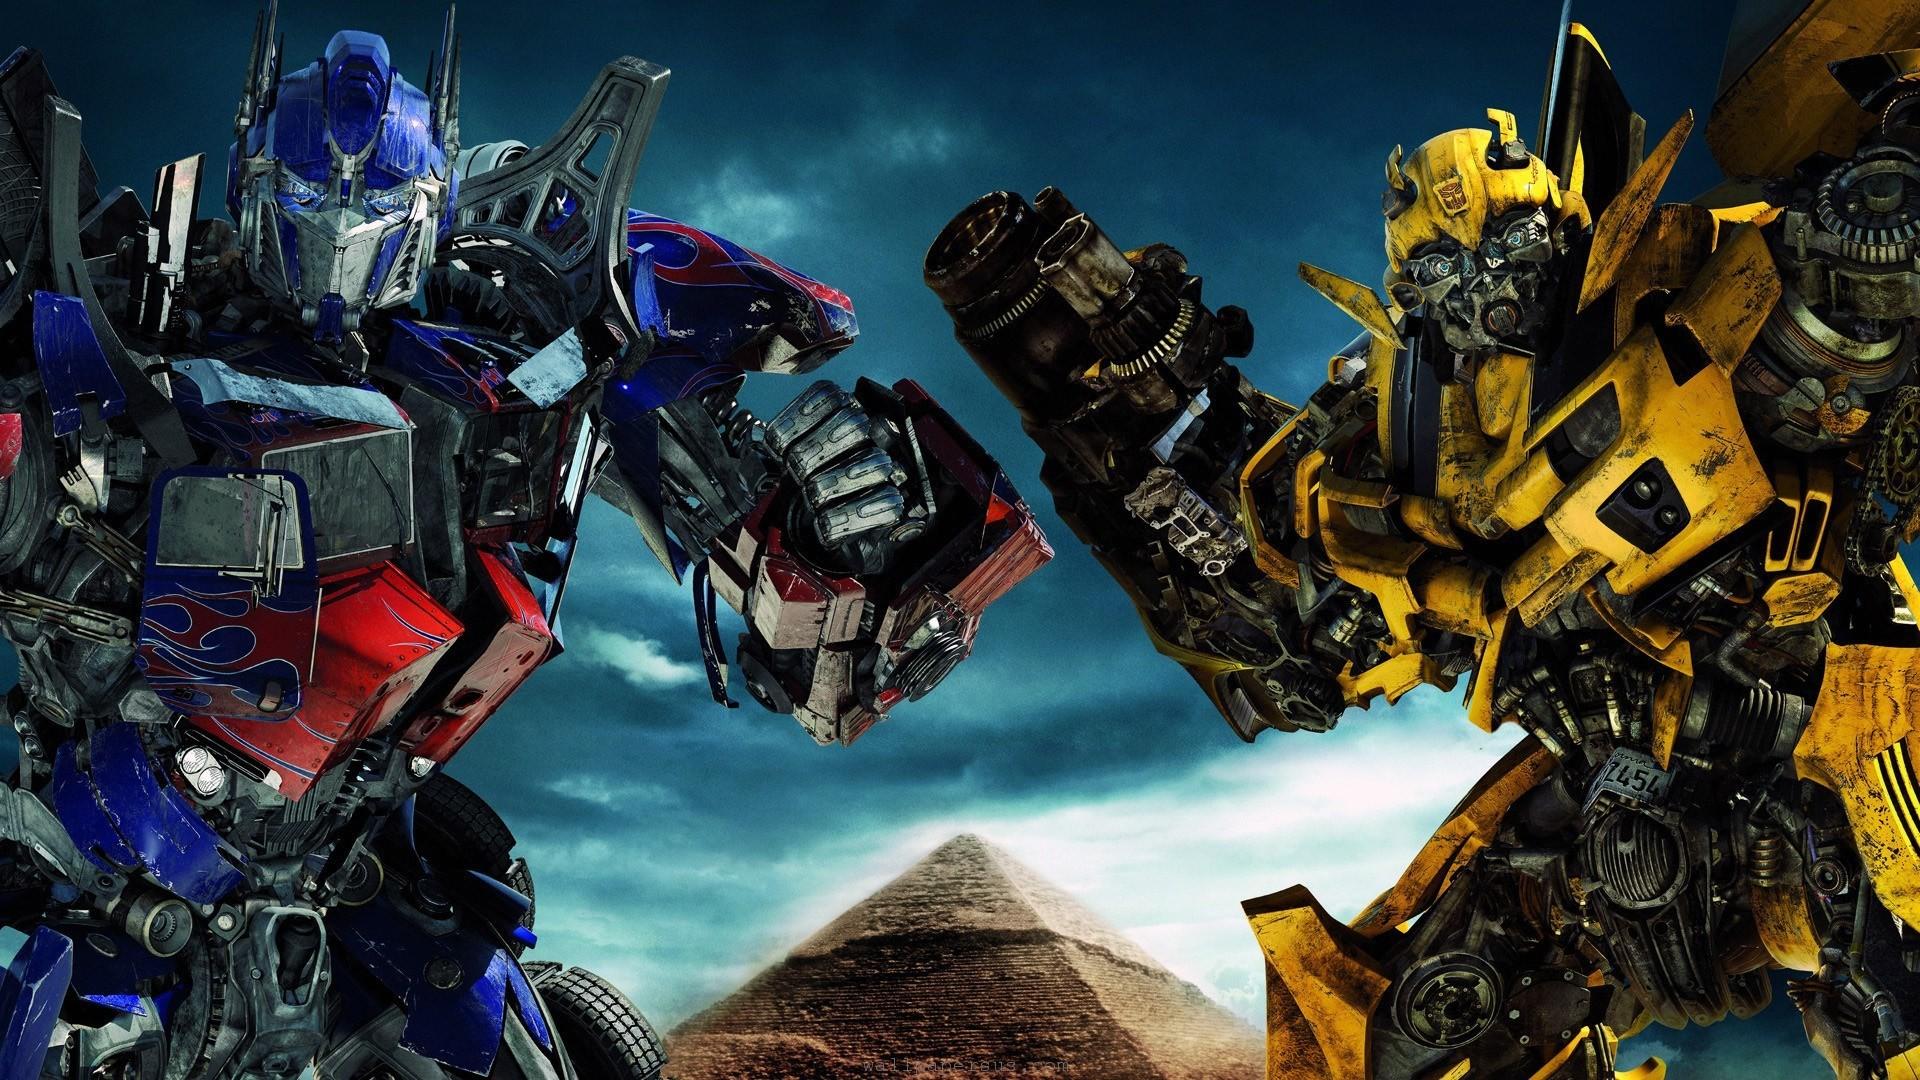 Transformers Wallpaper For Desktop Background Ololoshka - Optimus Prime And Bumblebee Wallpaper Hd - HD Wallpaper